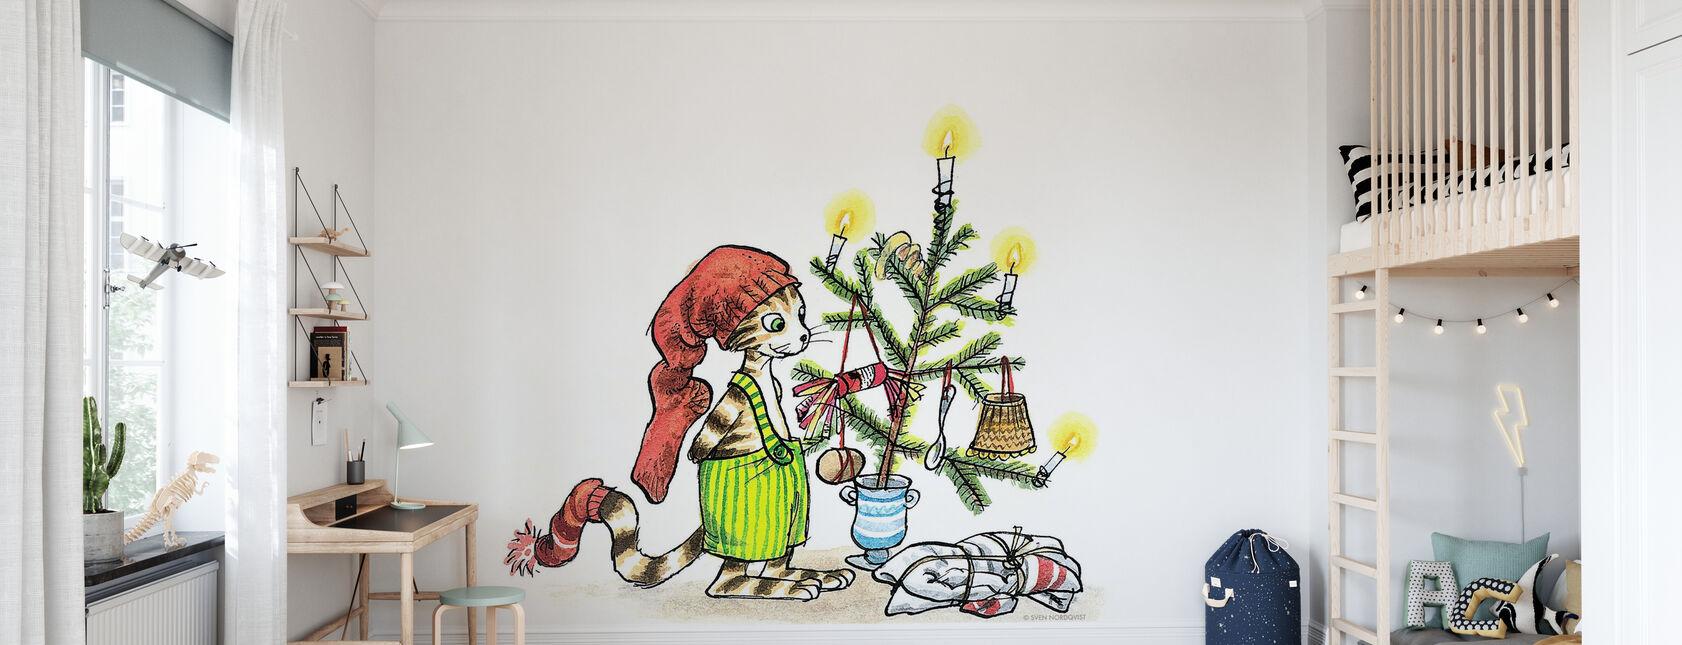 Pettson gets Christmas visits - Wallpaper - Kids Room